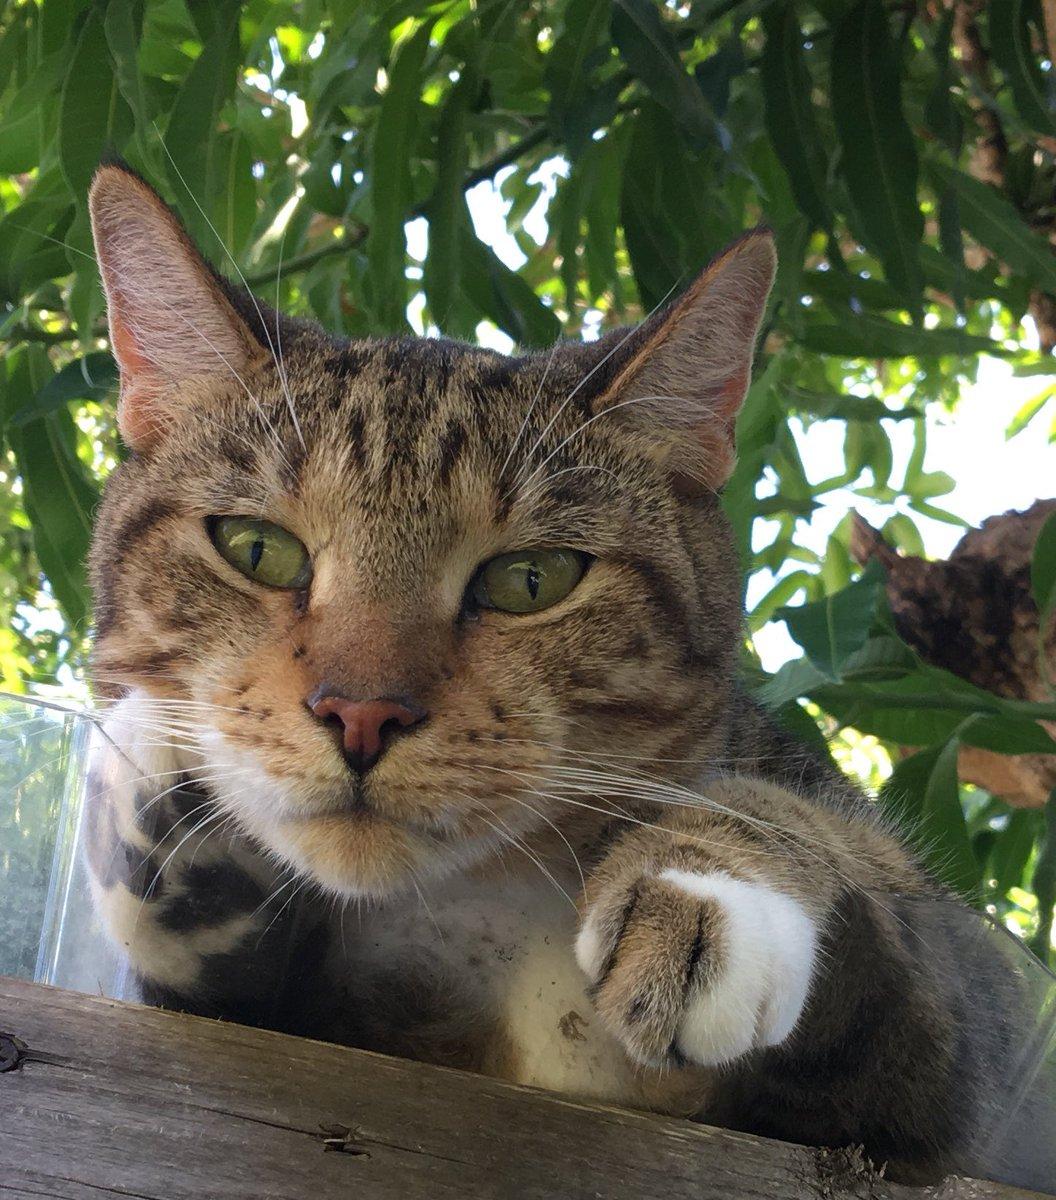 Cairo judges hard #catsjudgingkellyanne